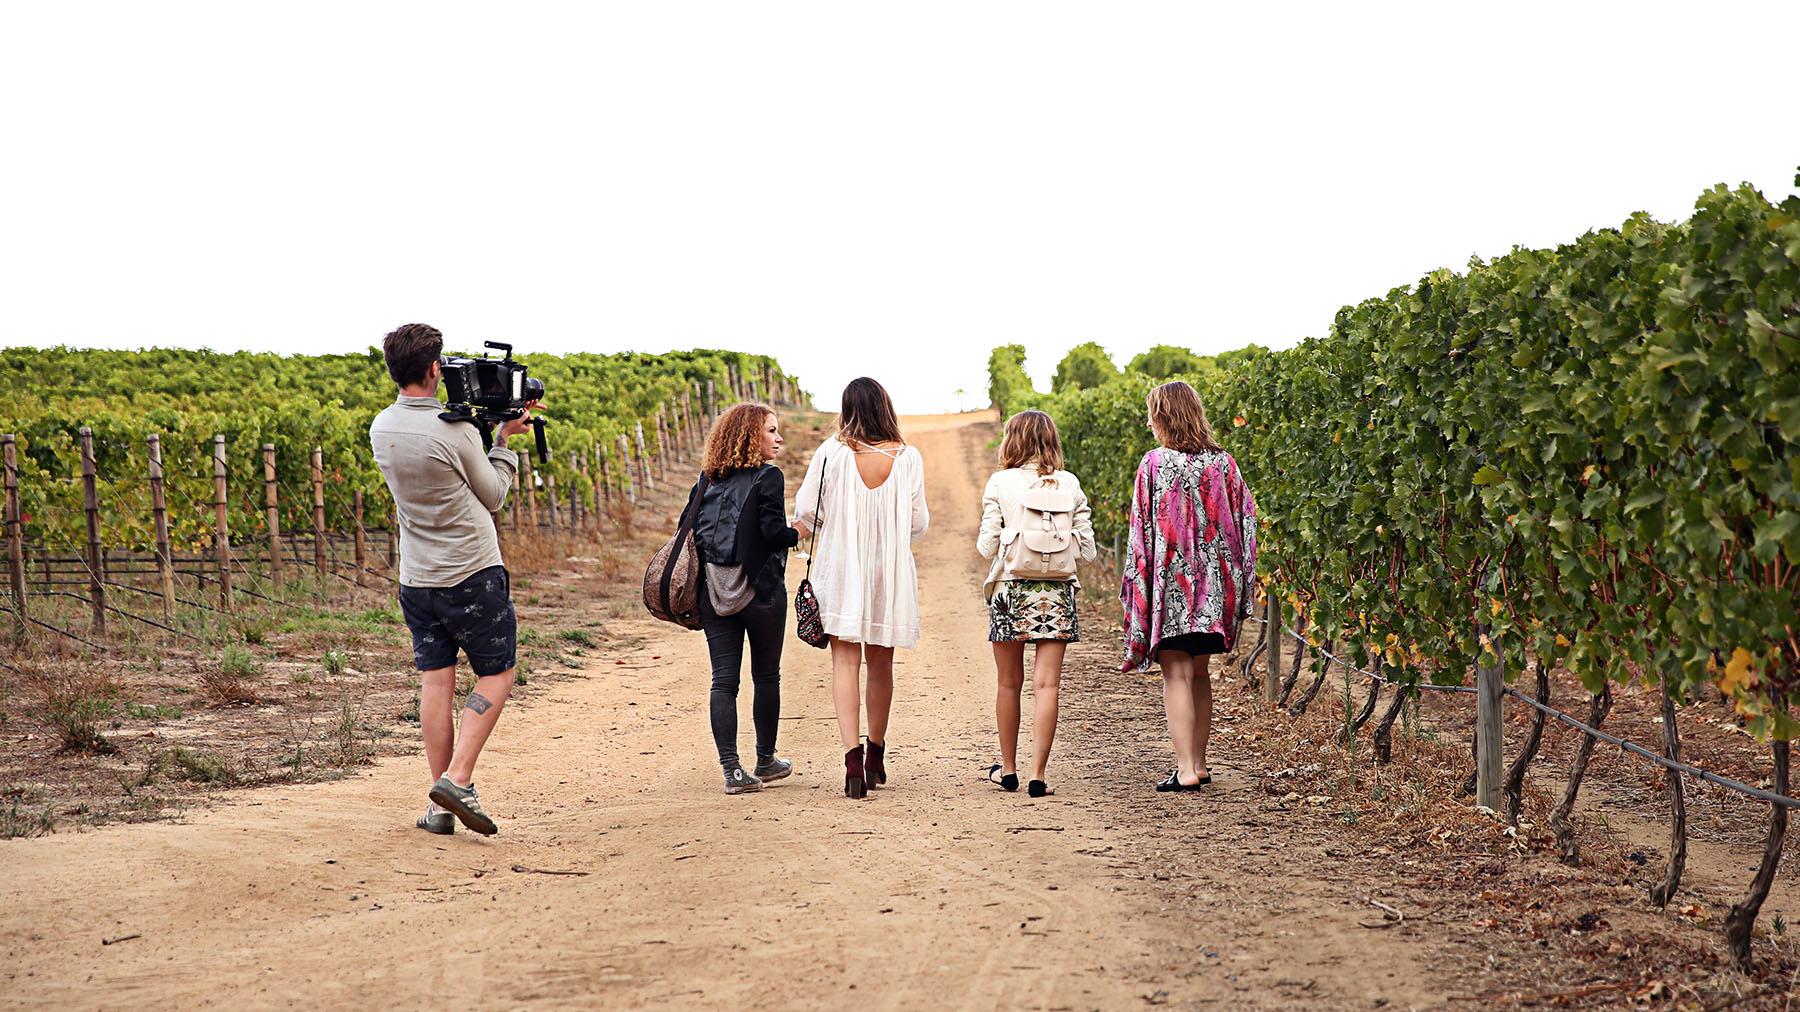 trendy-taste-look-outfit-street-style-ootd-blog-blogger-fashion-spain-moda-españa-piz-buin-sa-south-africa-cape-town-spot-summer-verano-7